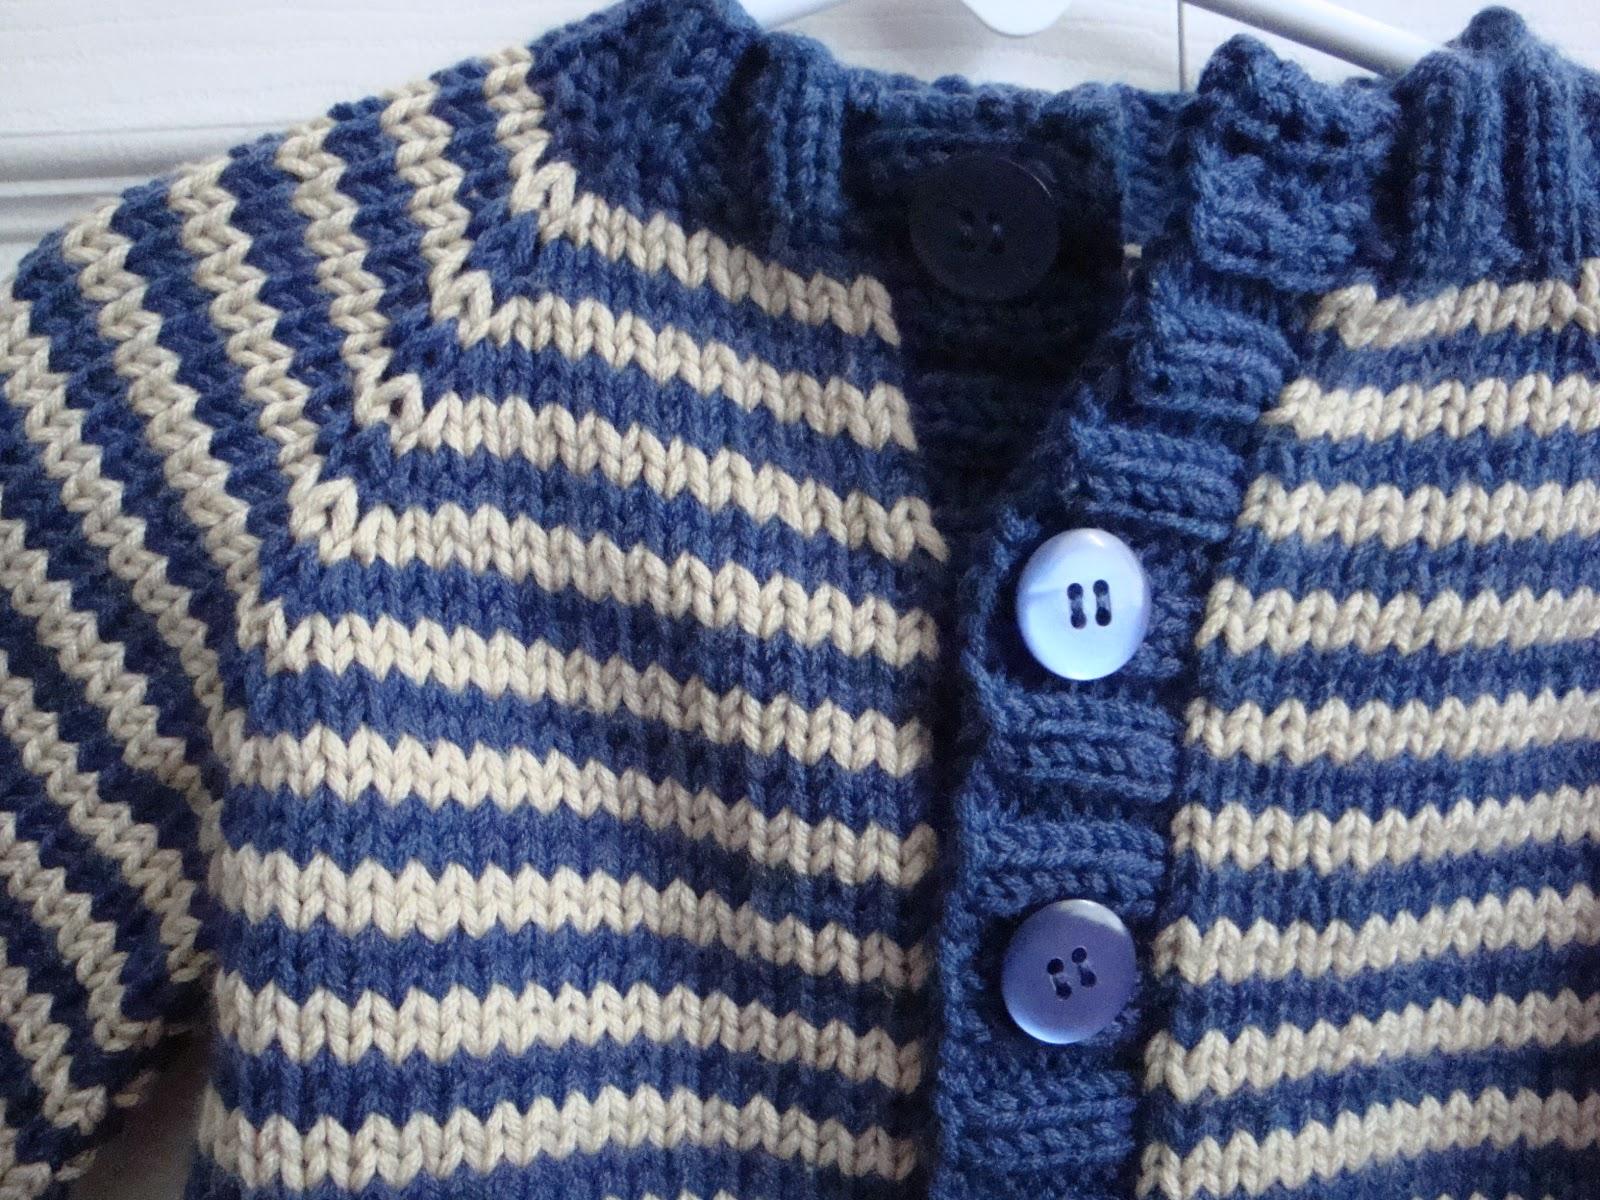 Boy Sweater Knitting Pattern : Kims Knitting Korner: Little Coffee Bean Sweater: For Grants Baby Boy